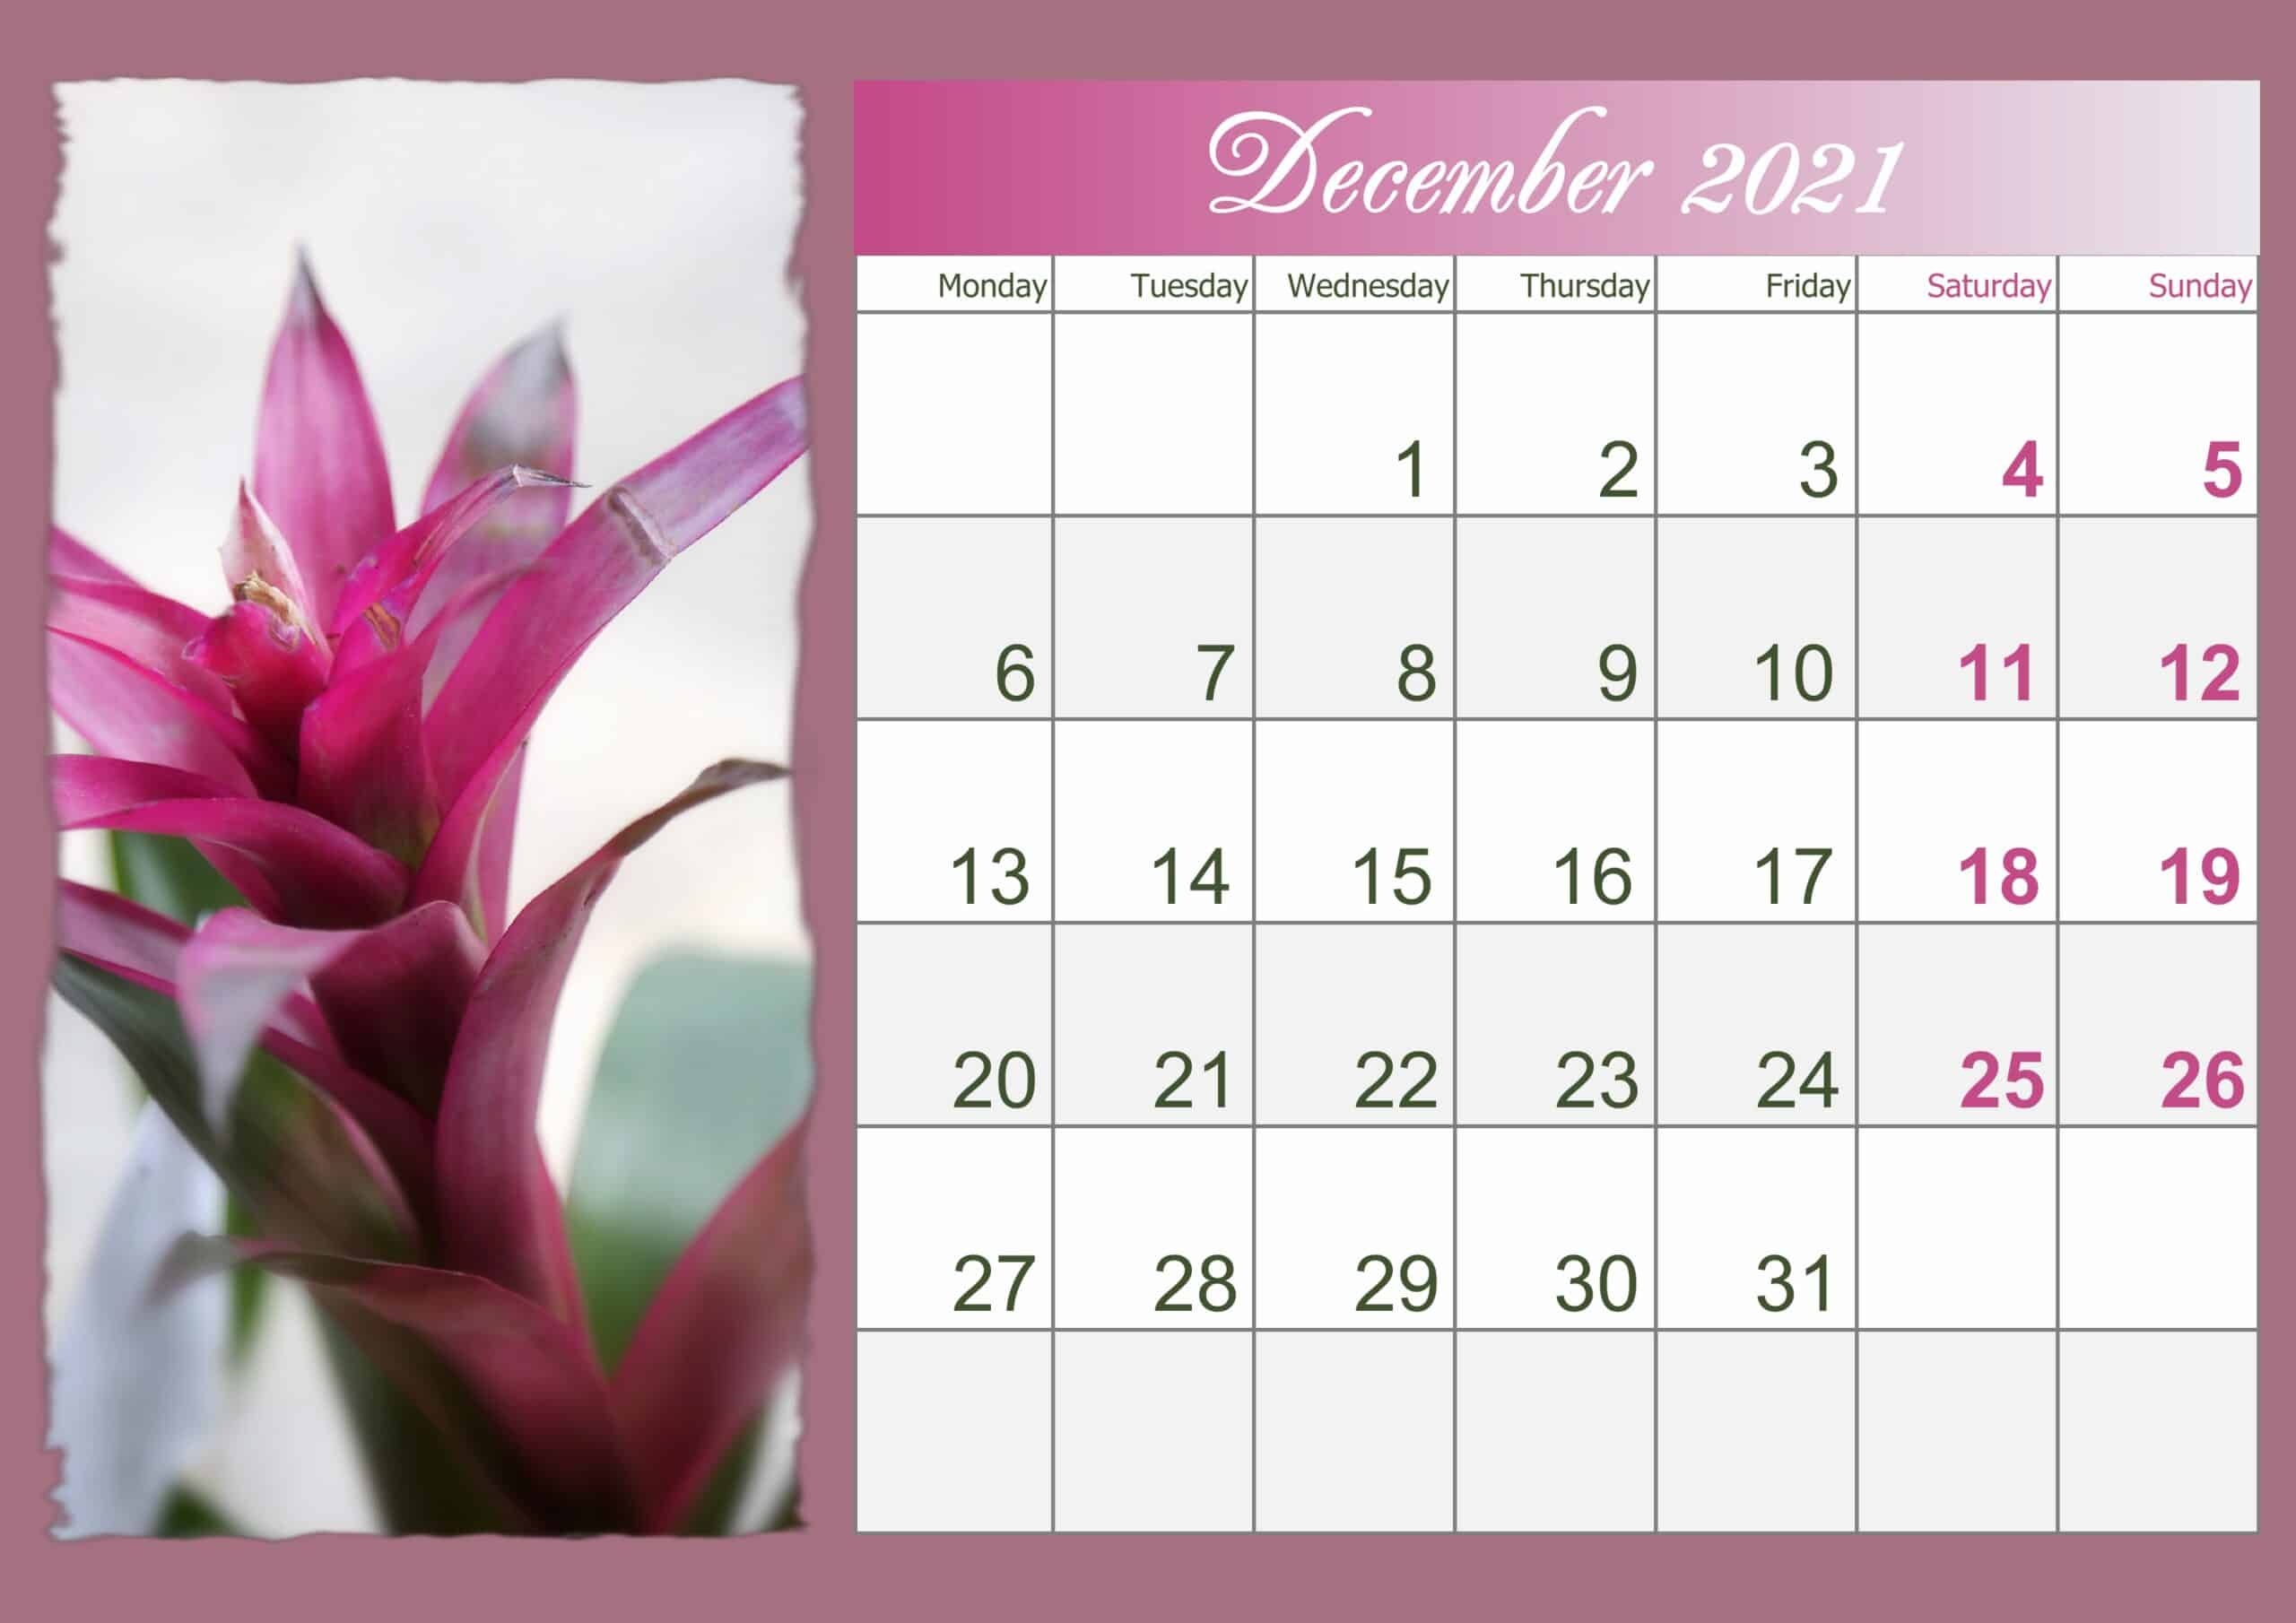 December Printable 2021 Calendar